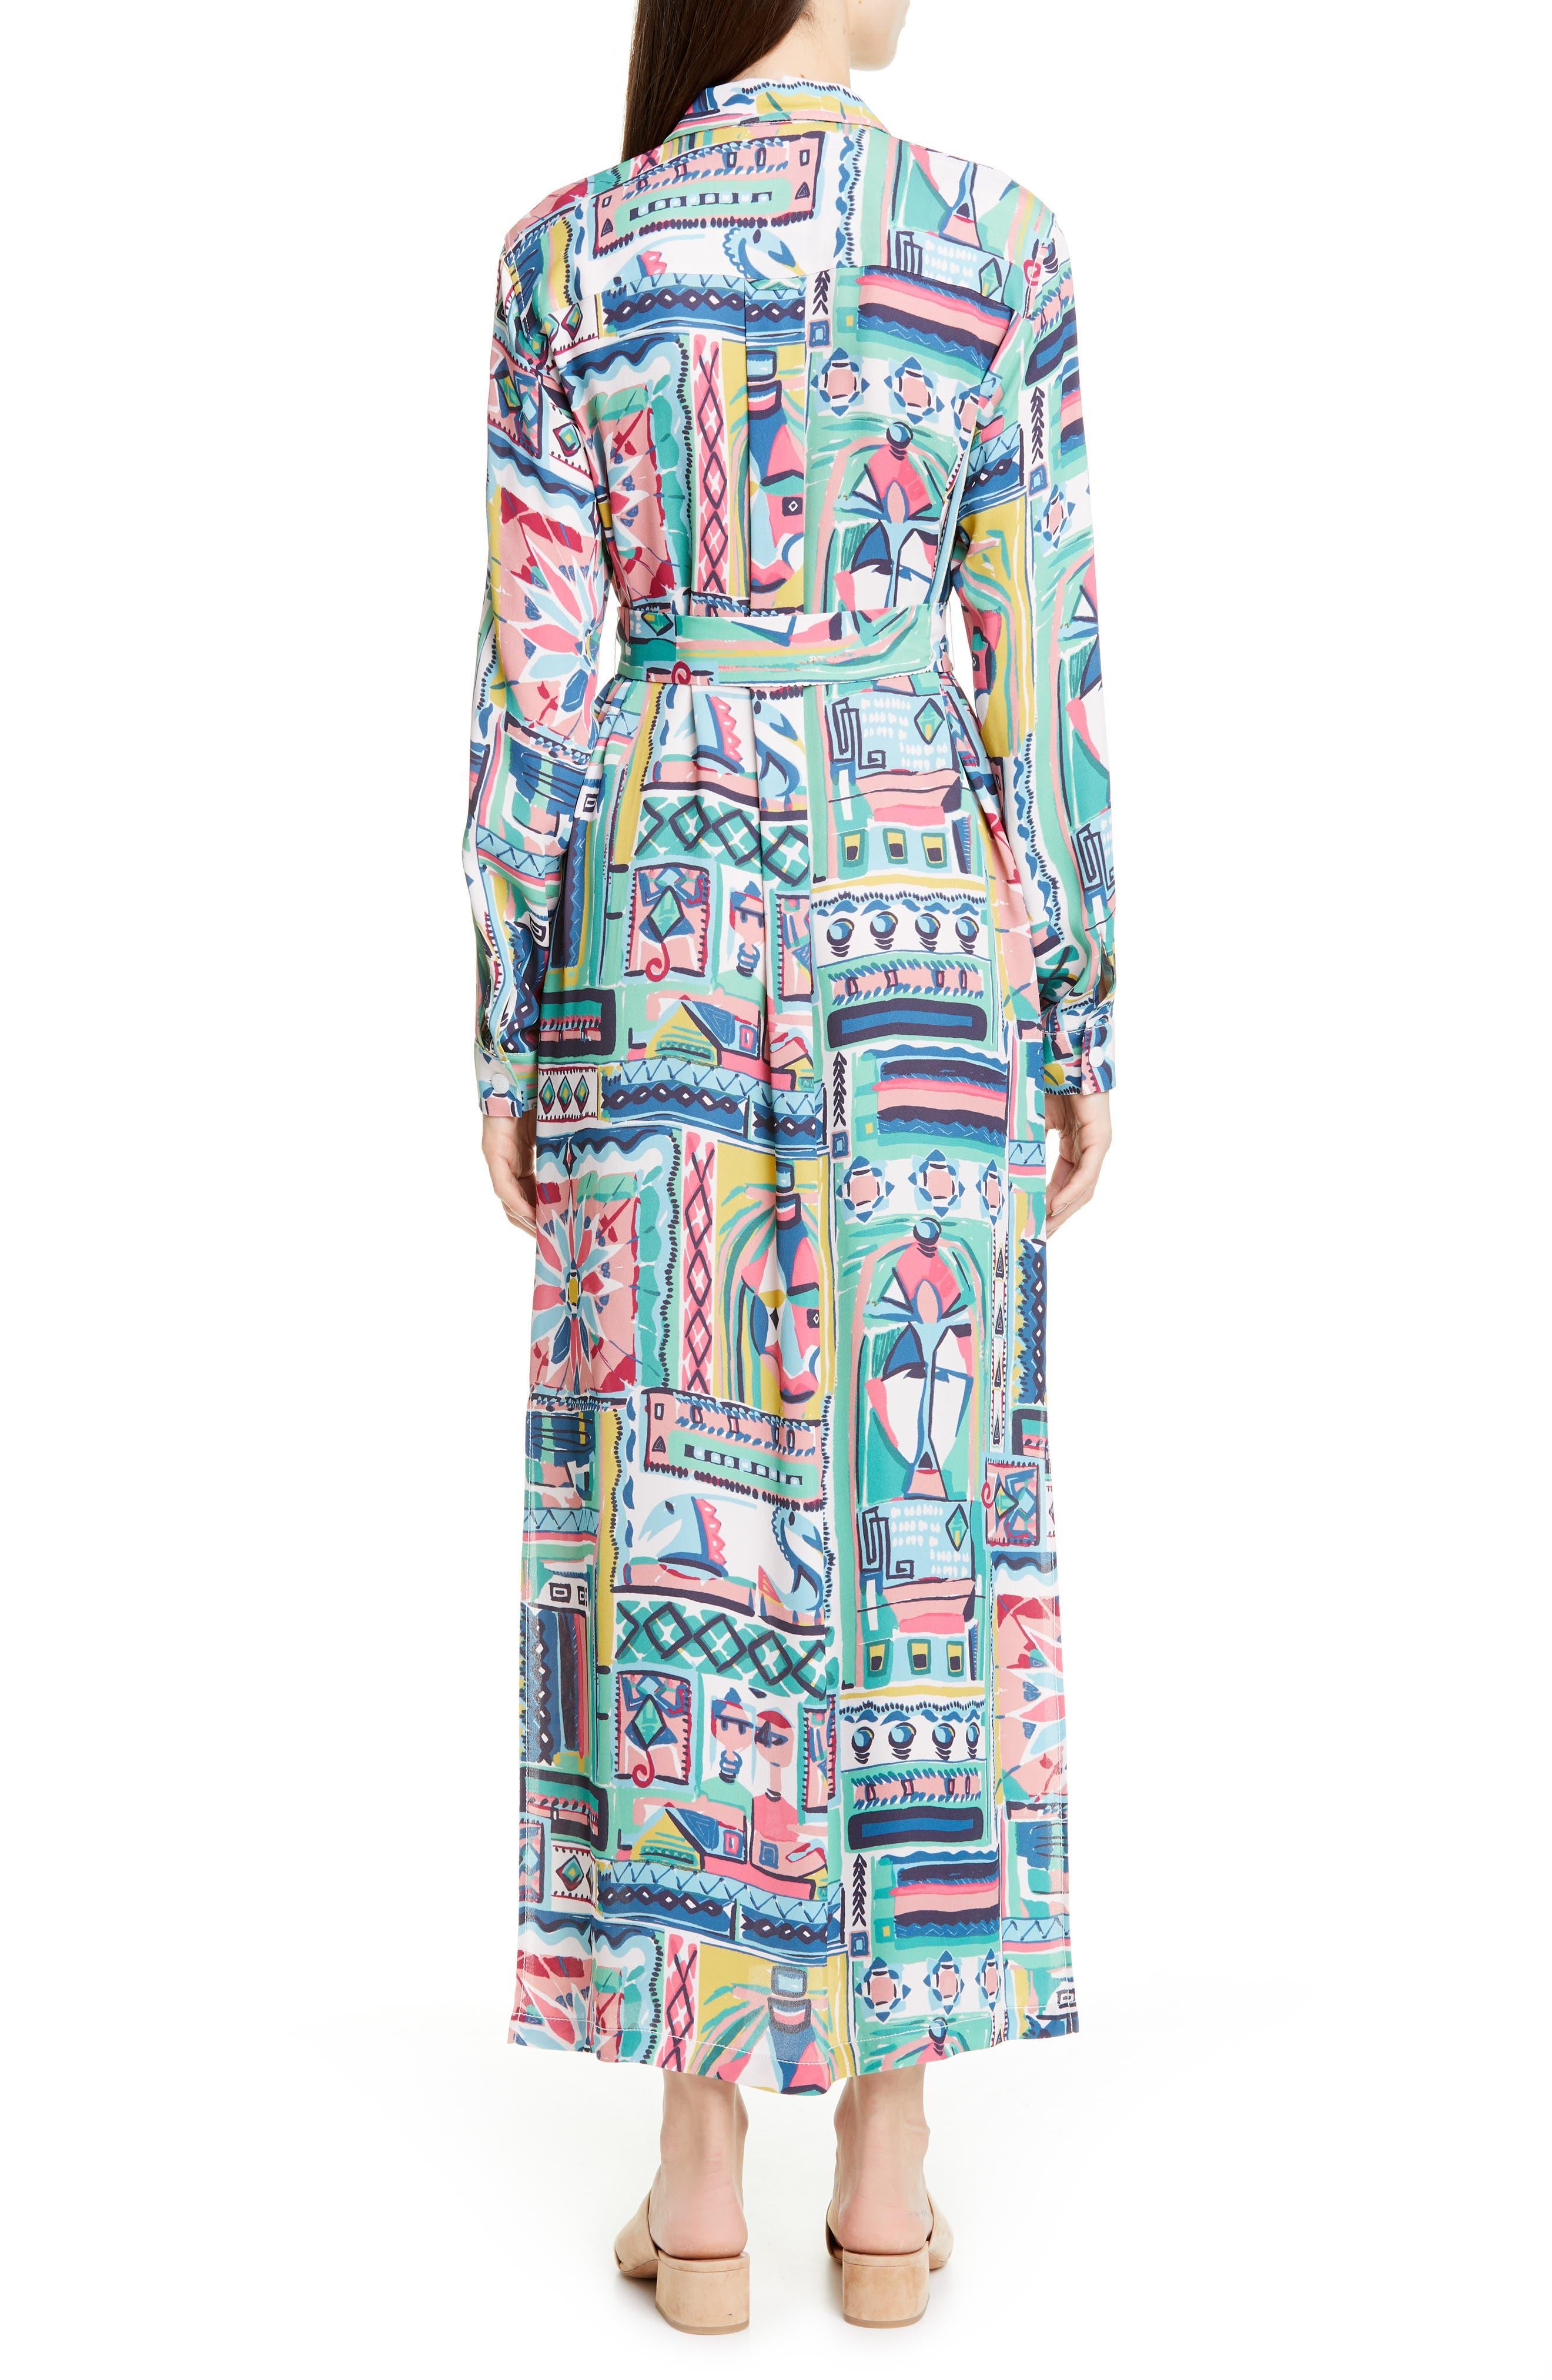 LAFAYETTE 148 NEW YORK, Doha Palazzo Patchwork Print Maxi Shirtdress, Alternate thumbnail 2, color, 400